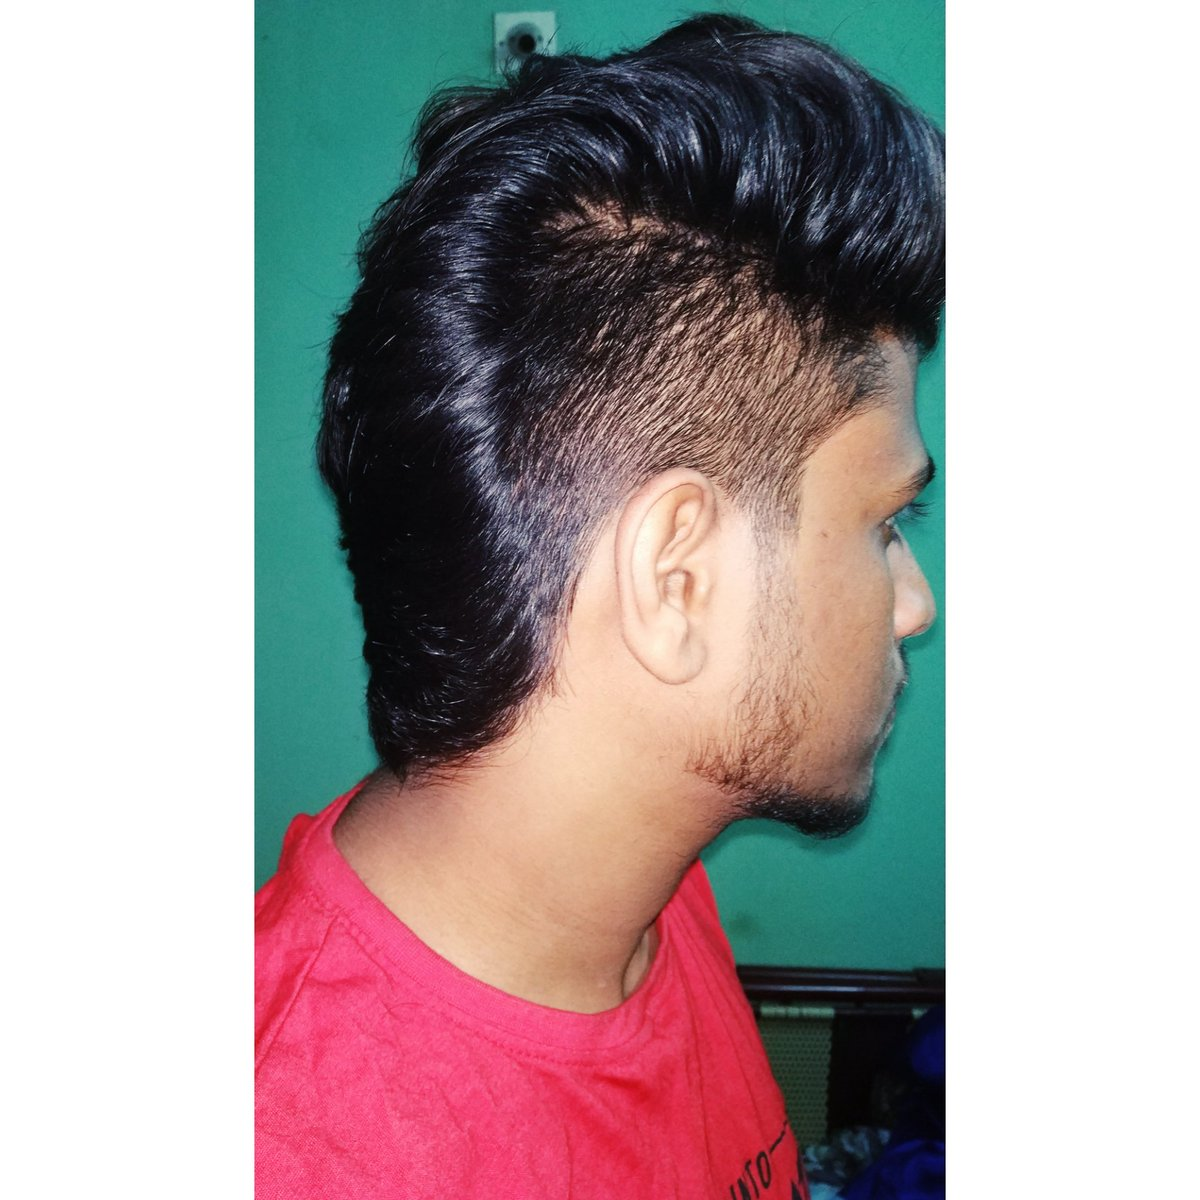 New hair cut   #hairLove <br>http://pic.twitter.com/4DQqIKo7tO